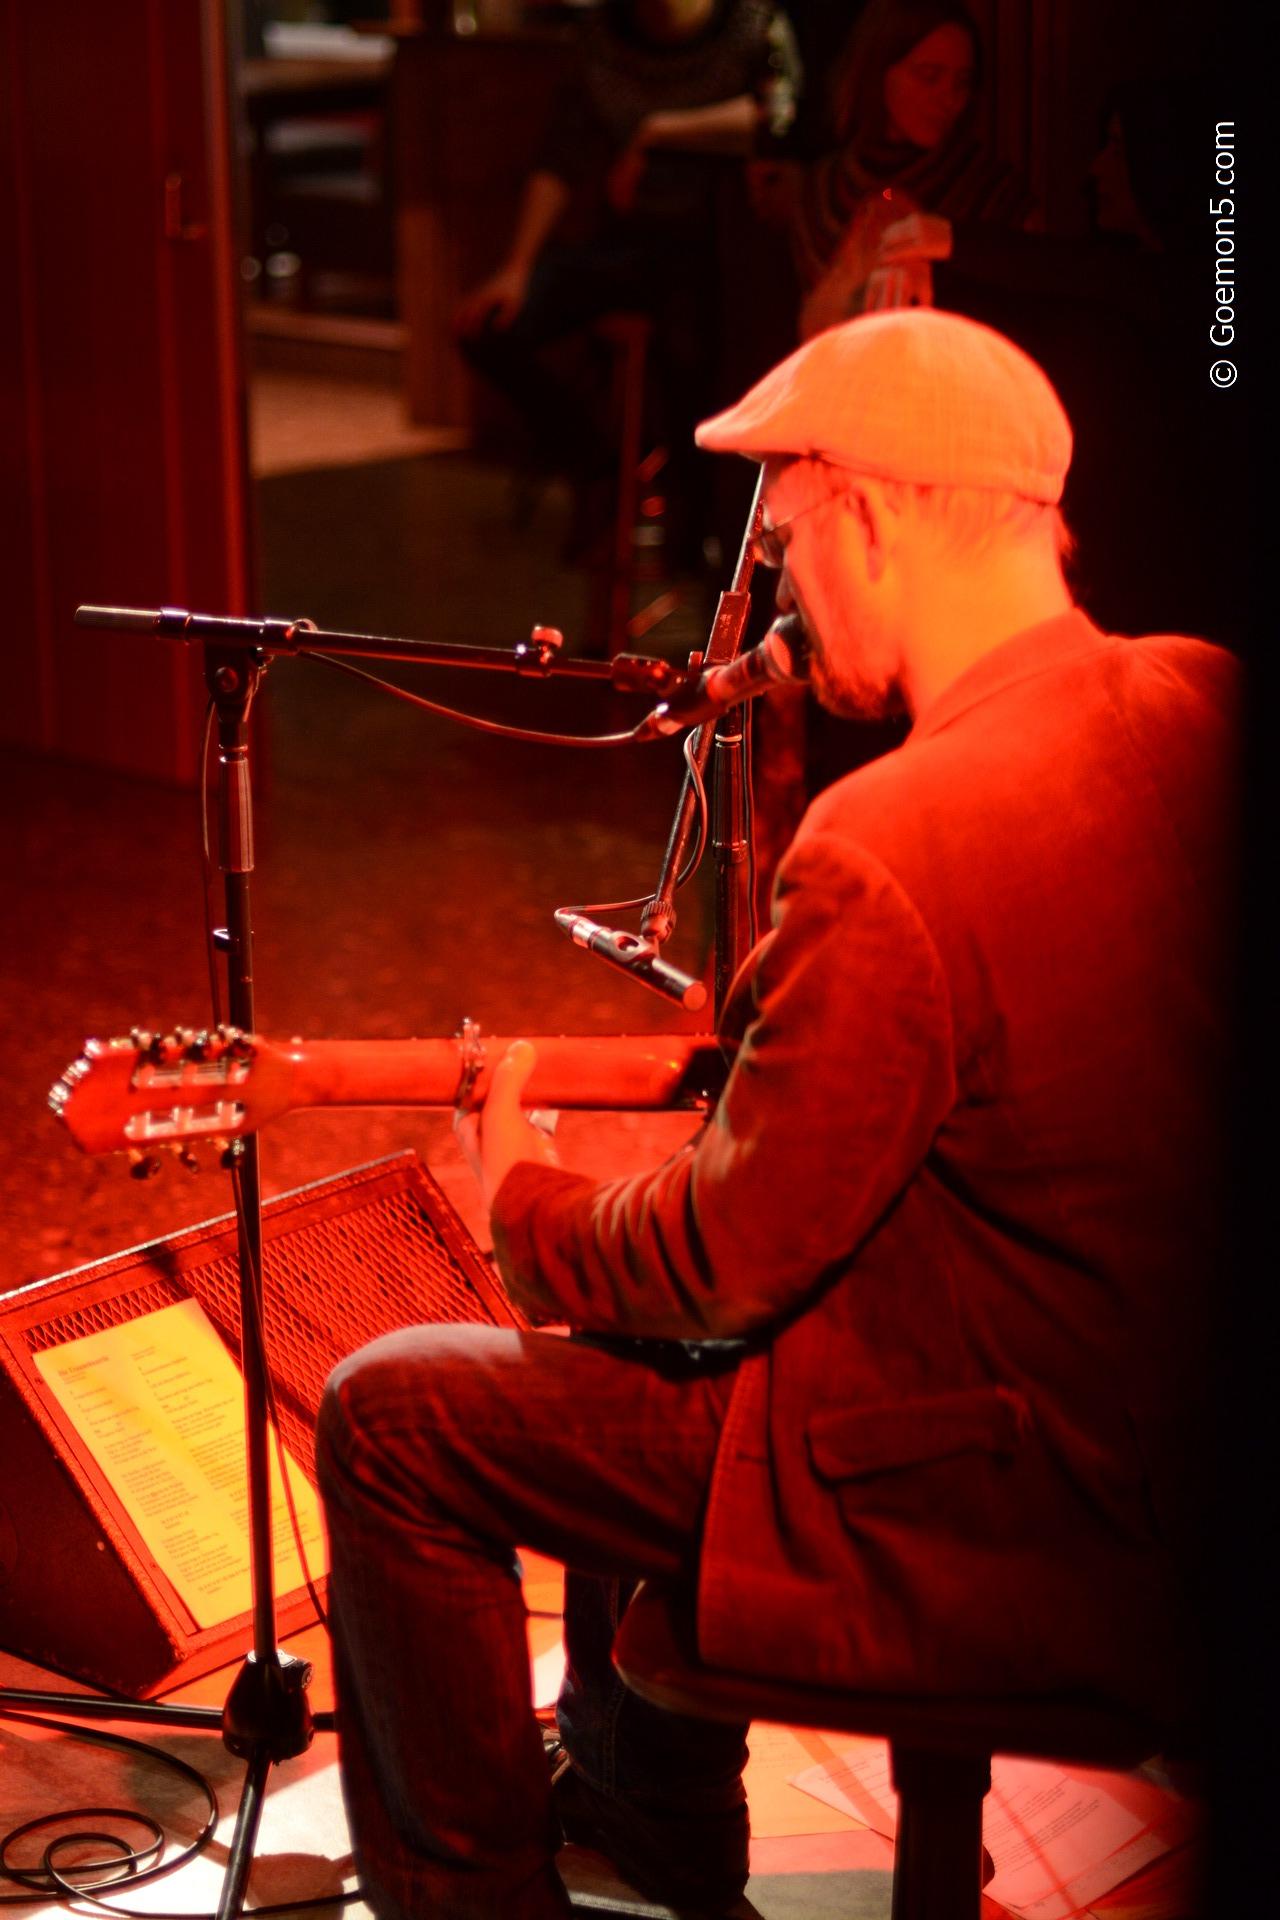 Thomas Strauch at ParkClub 16